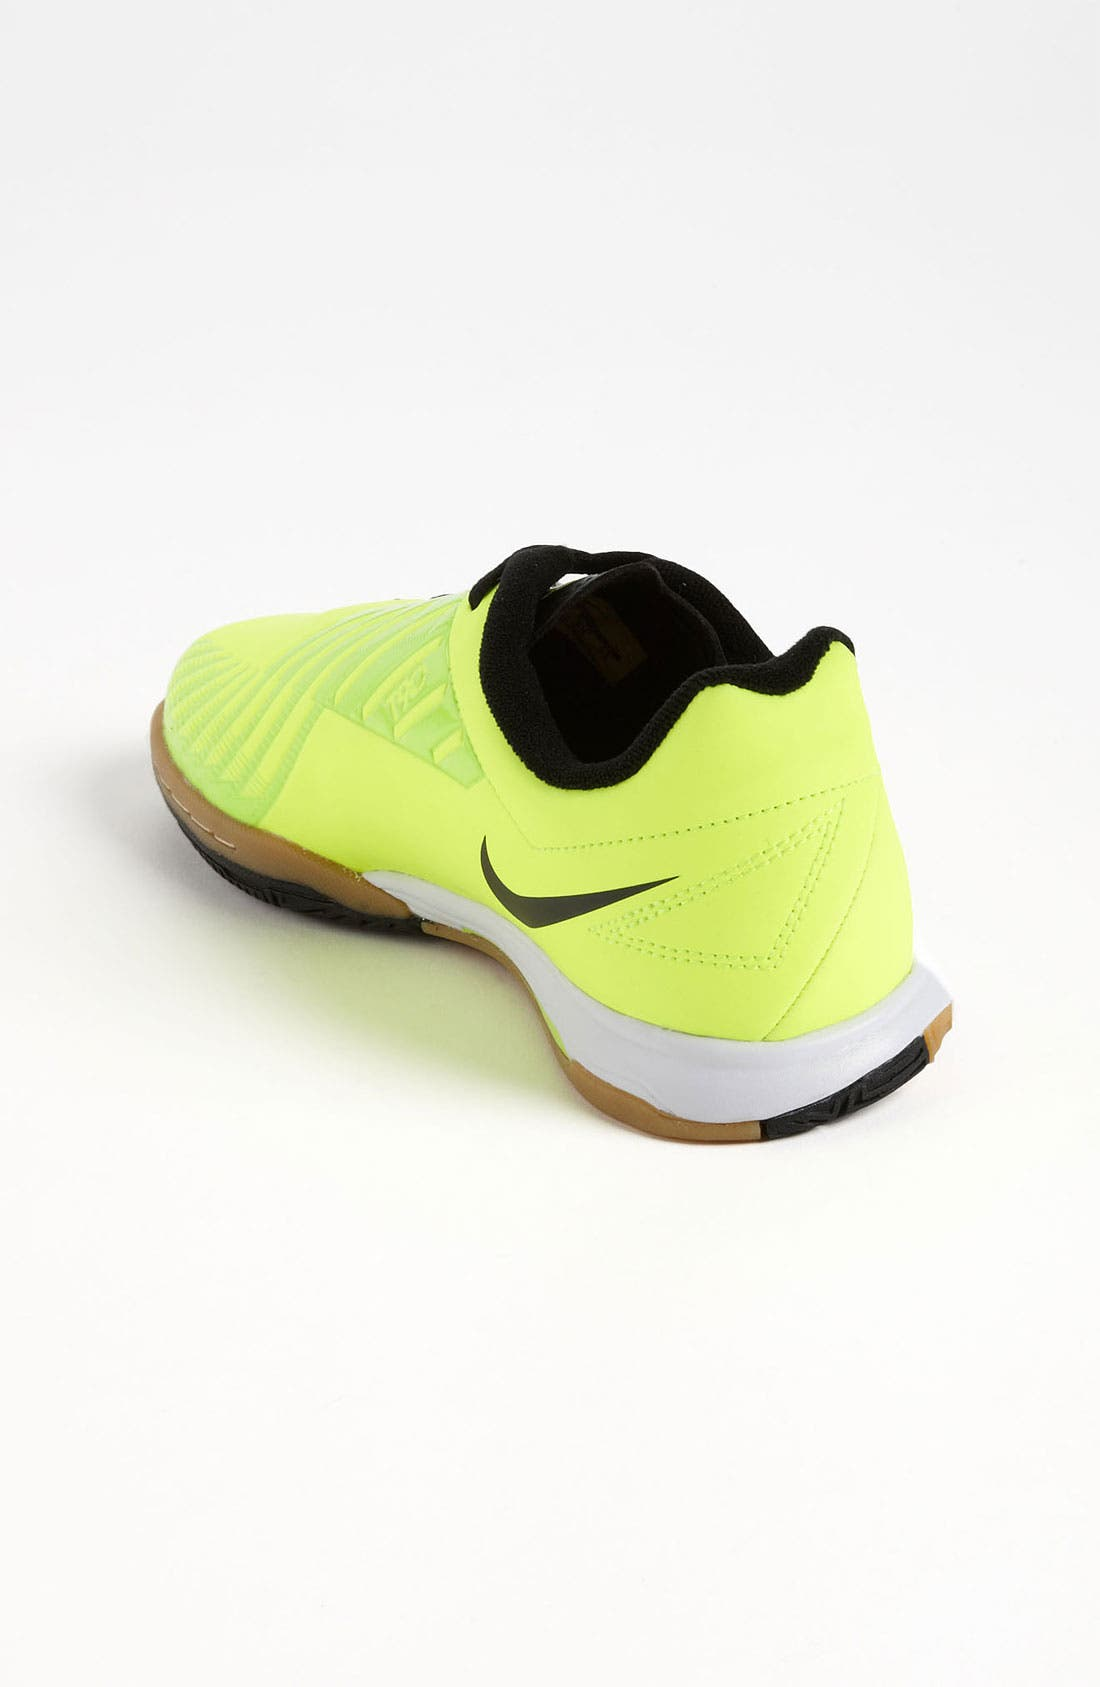 Alternate Image 2  - Nike 'T90 Shoot IV' Soccer Shoe (Toddler, Little Kid & Big Kid)